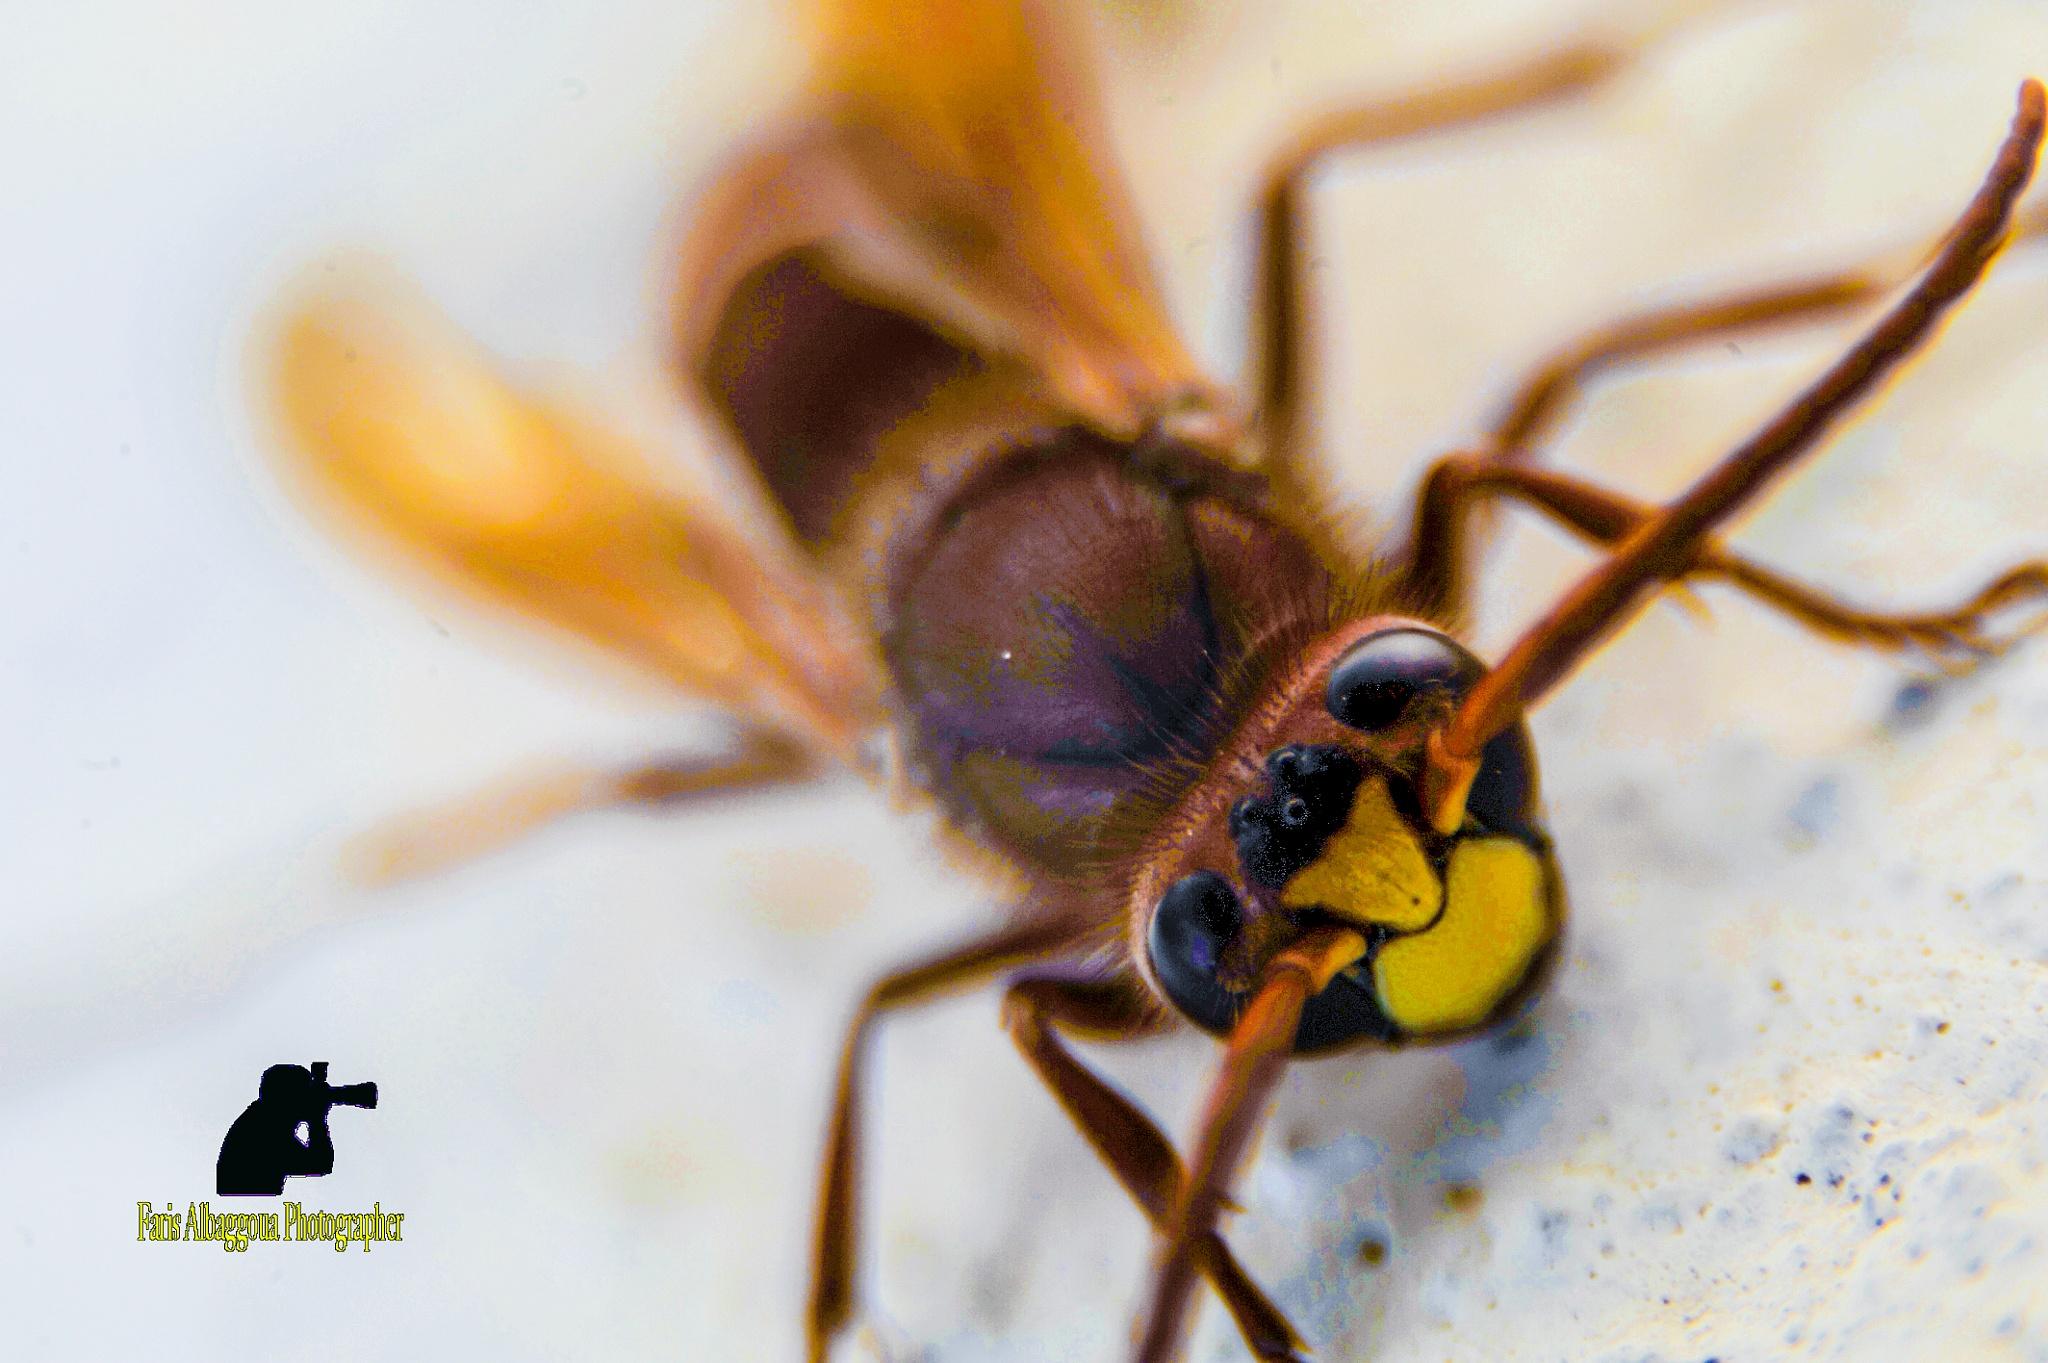 wasp by  faris albaggoua